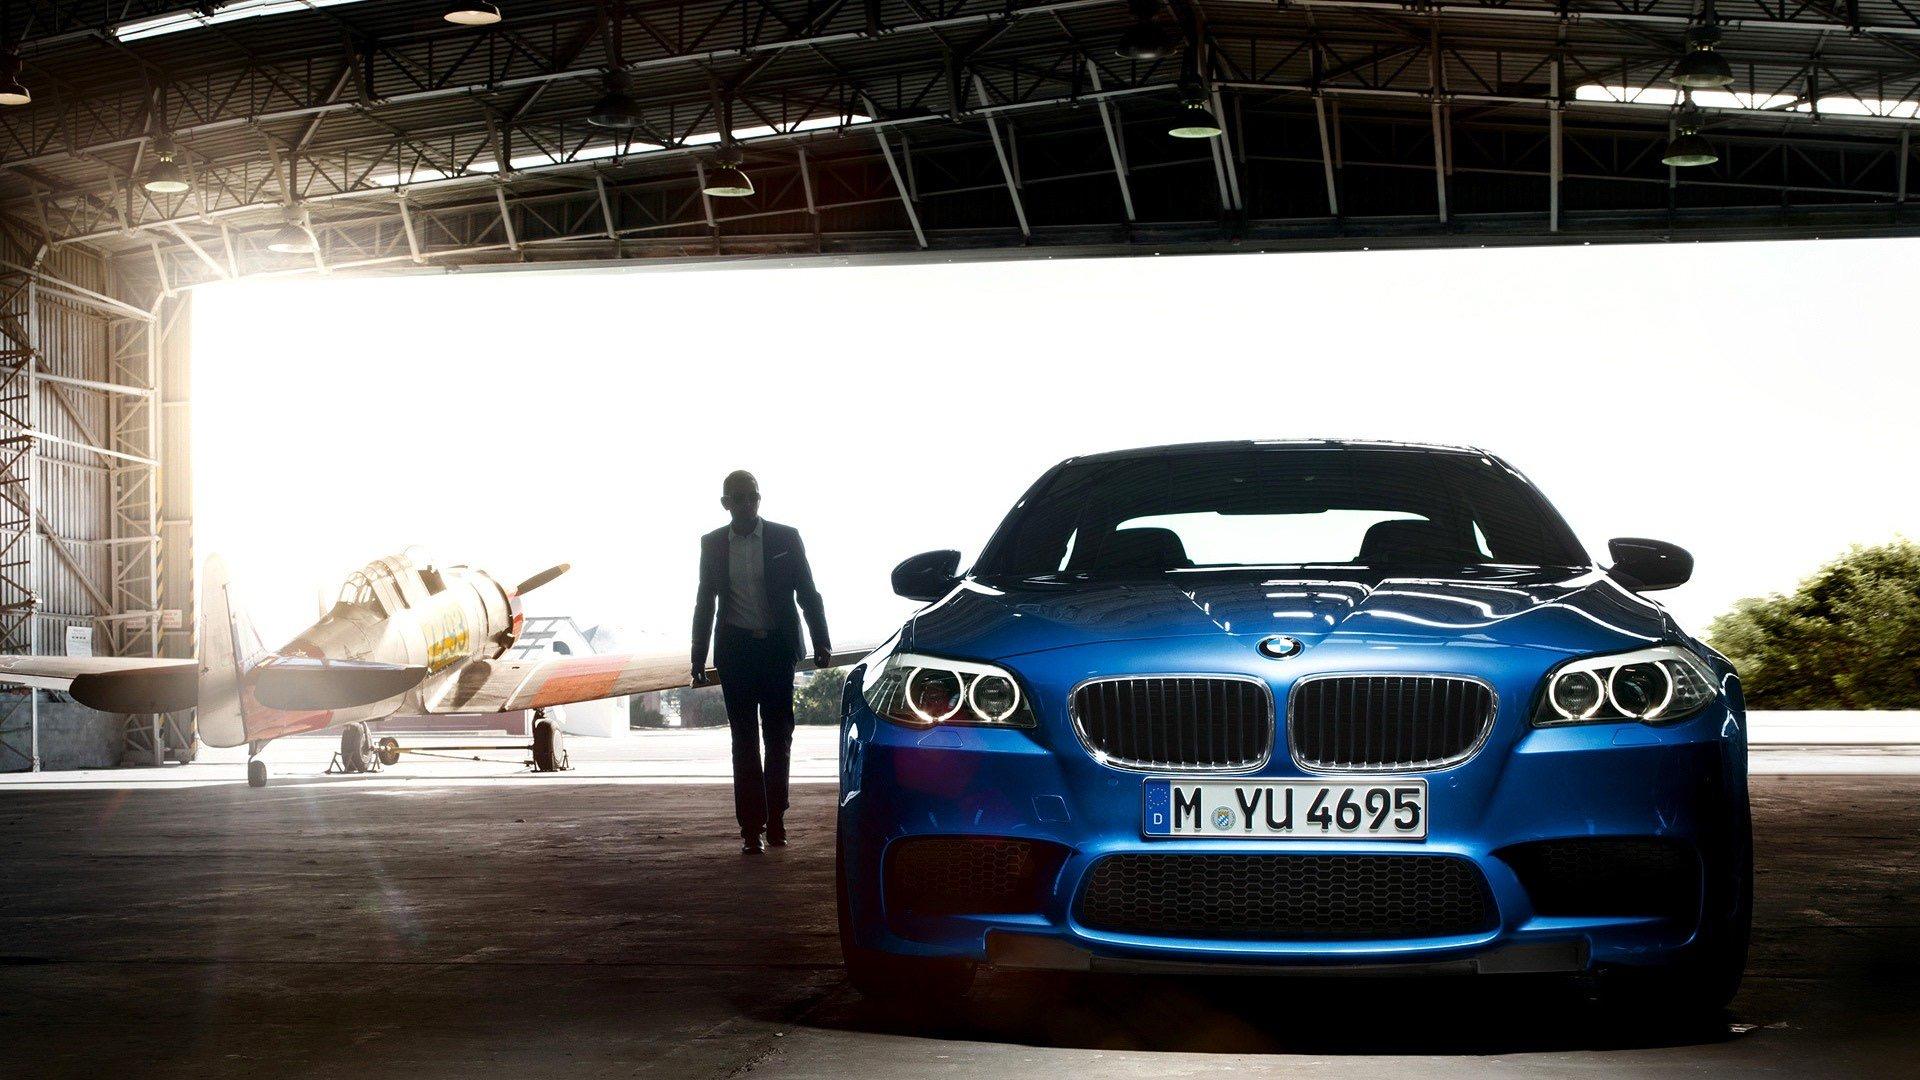 bmw-hangar-plane-blue-wallpaper-wallpapers-walls.jpeg